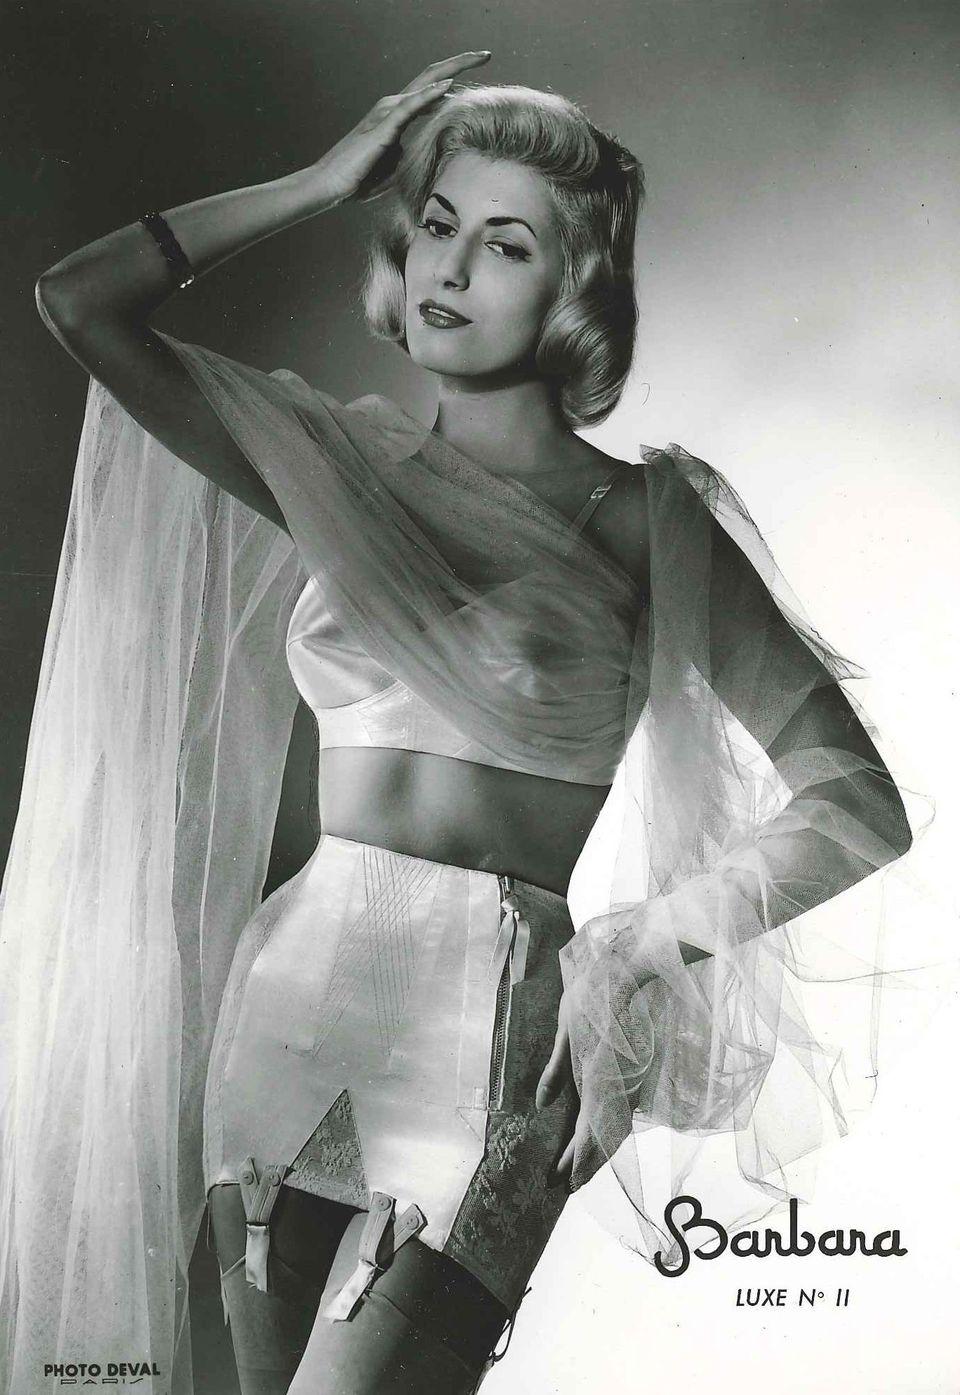 Barbara Collection of the 1950s, Barbara Patrimony